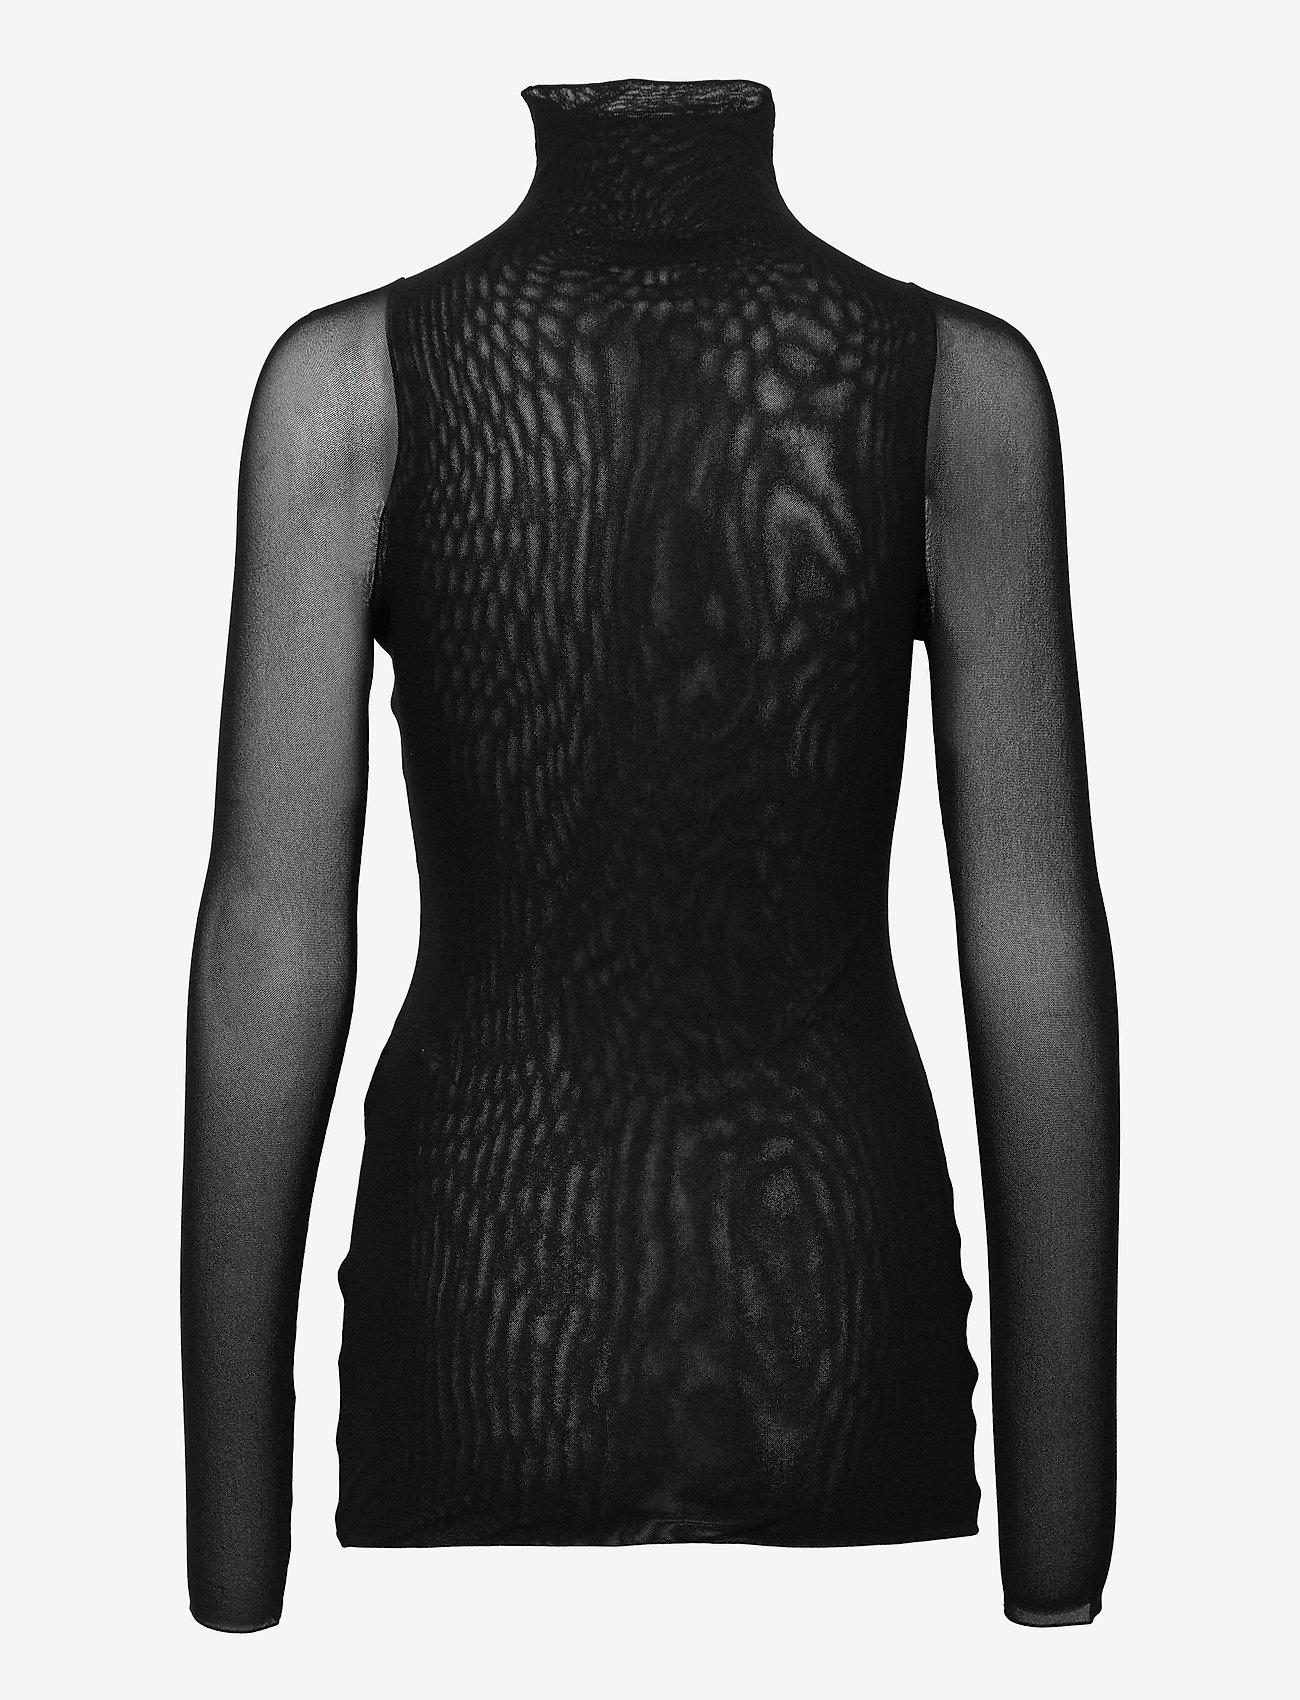 Max Mara Leisure - VELES - long-sleeved tops - black - 1